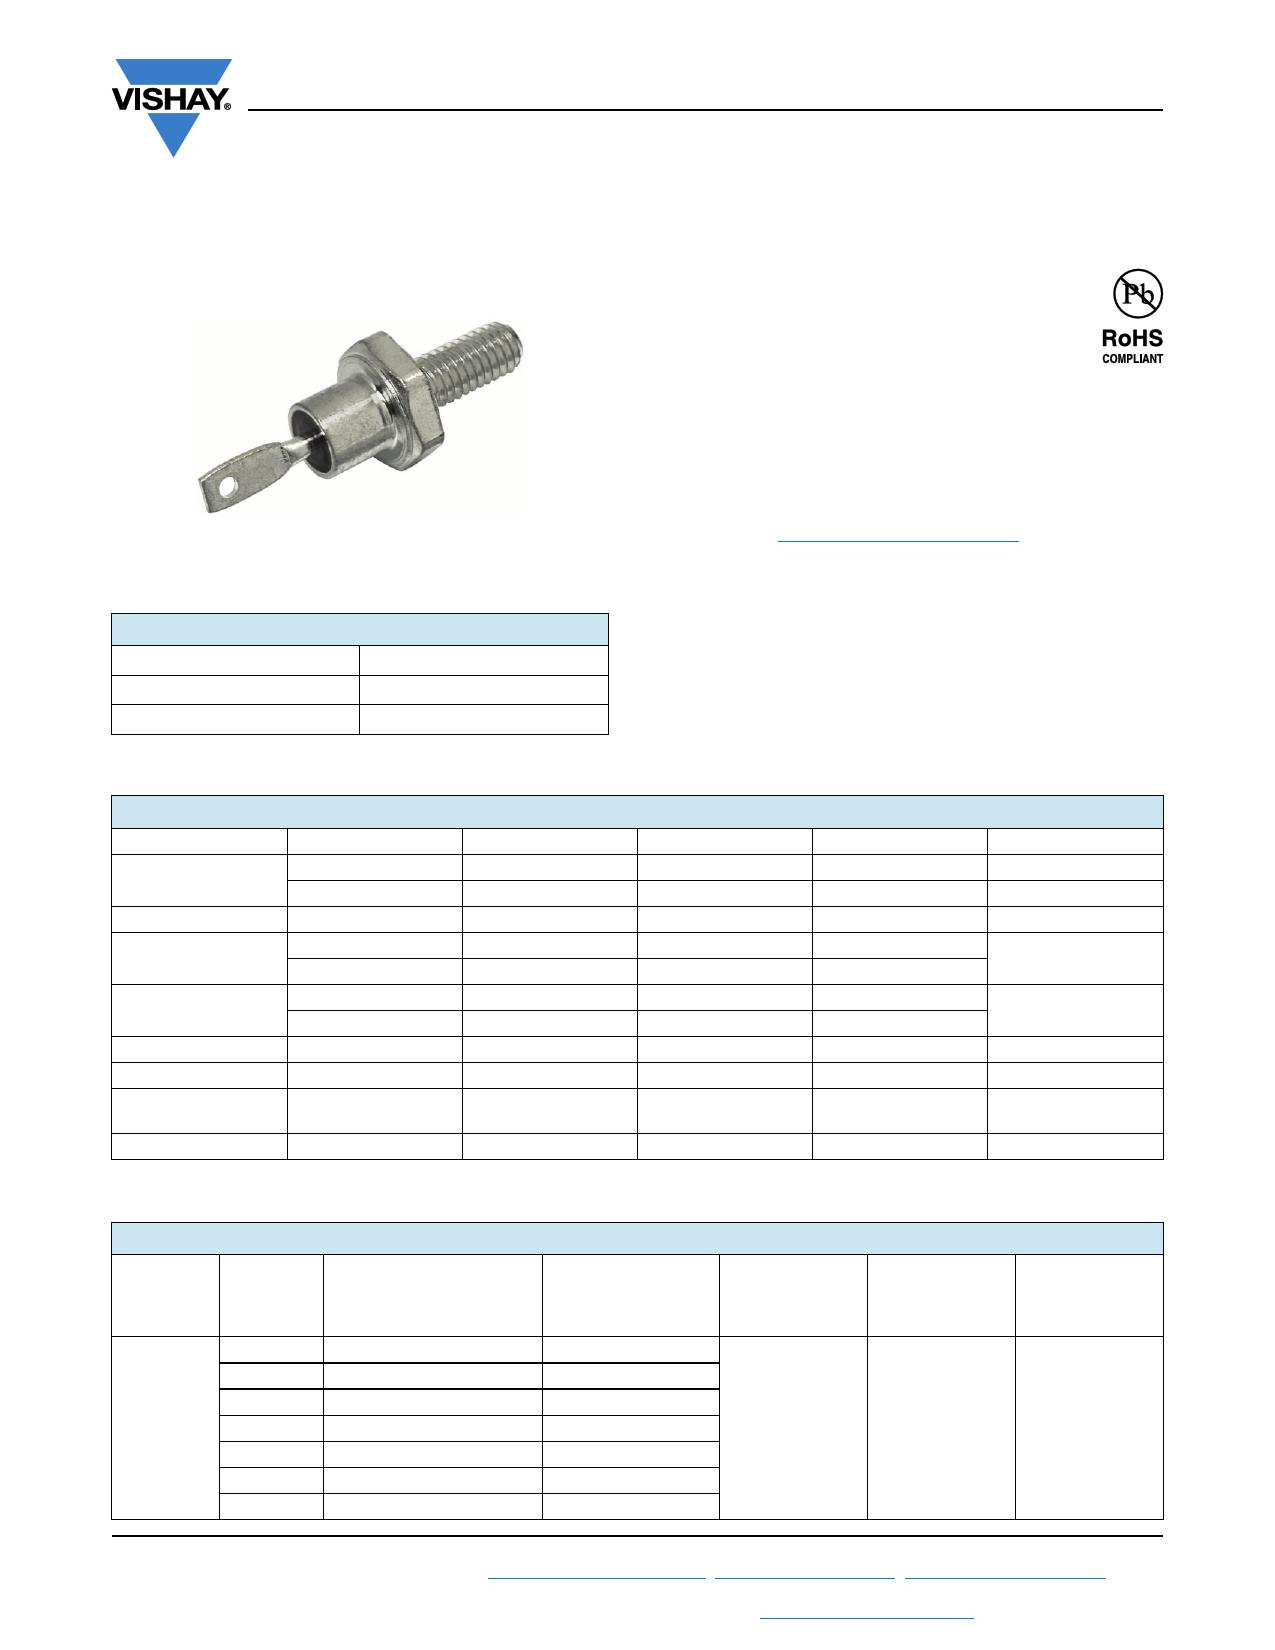 VS-1N3892 datasheet